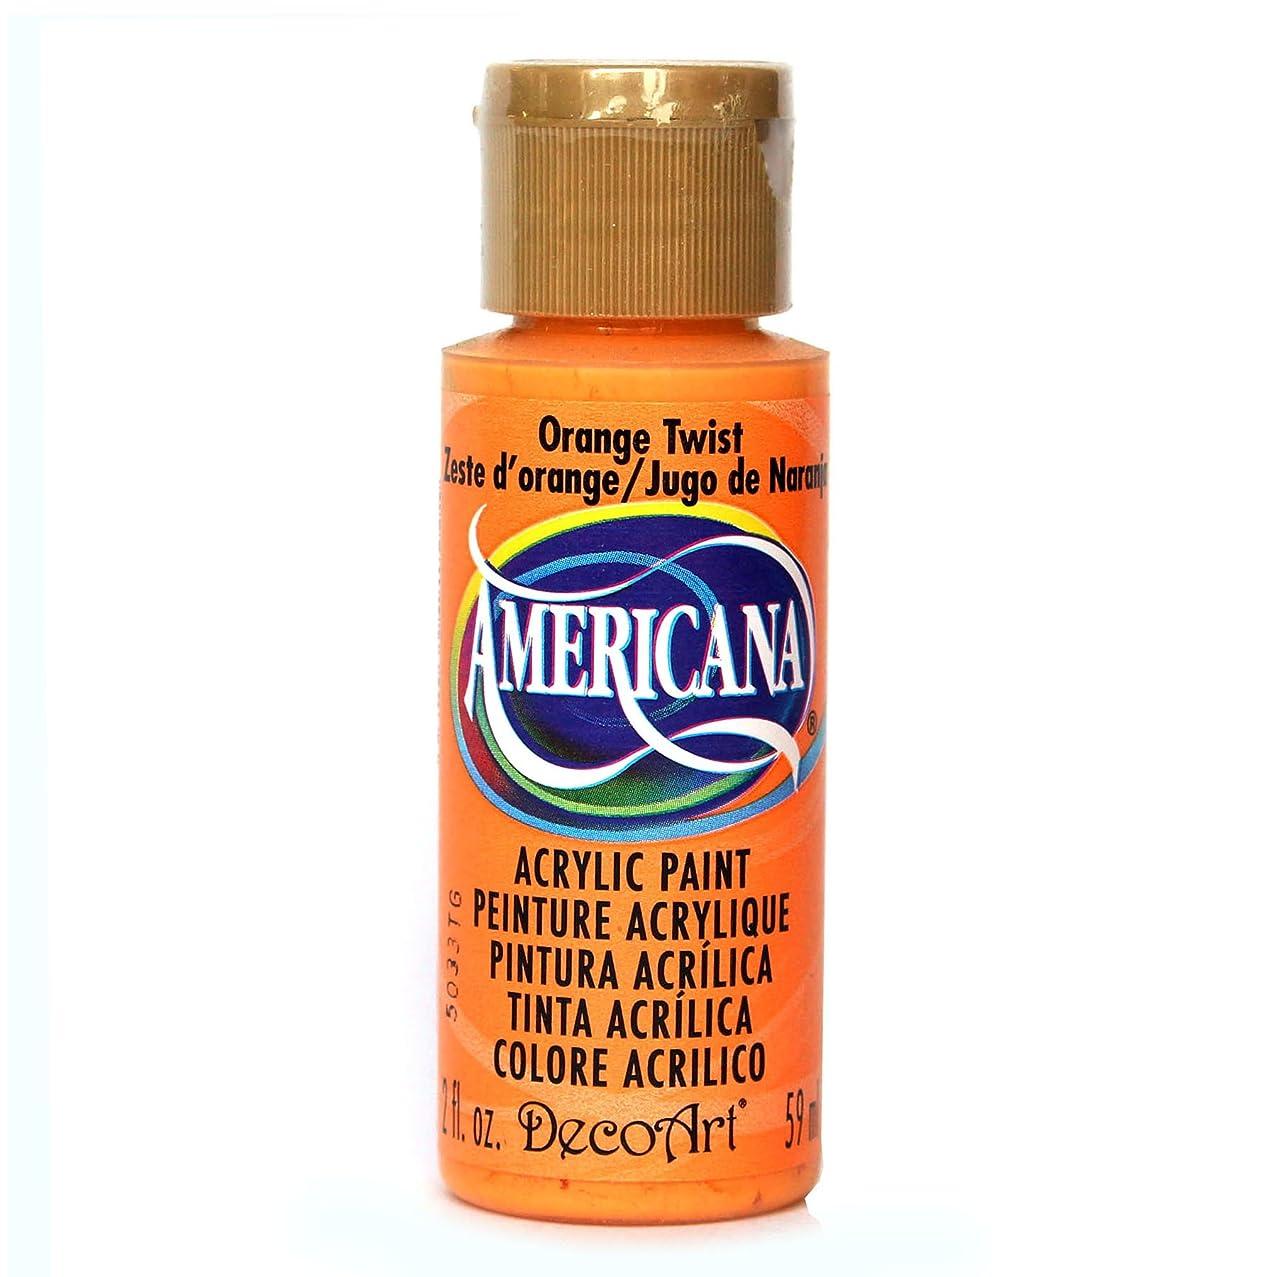 DecoArt Americana Acrylic Paint, 2-Ounce, Orange Twist